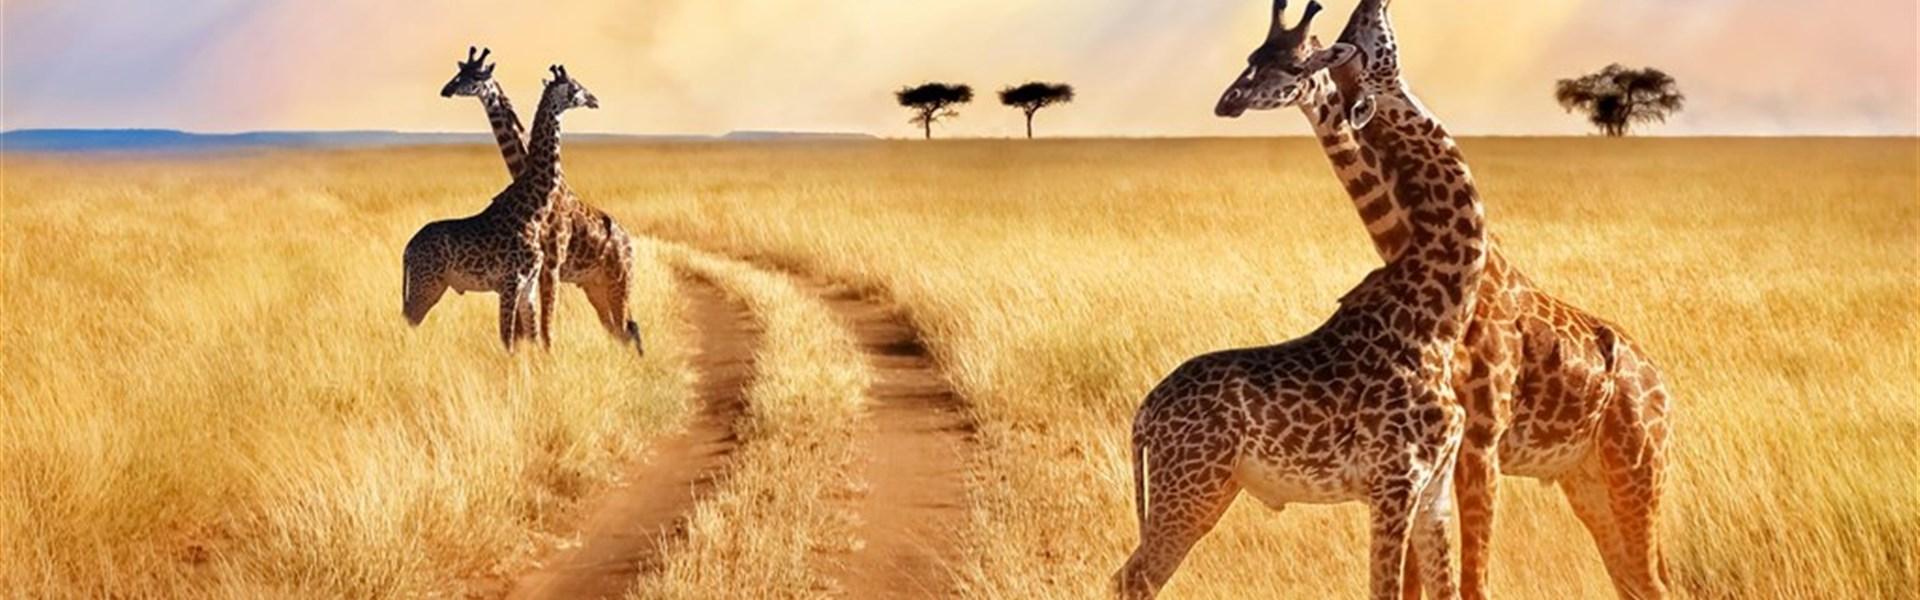 Safari v Tanzánii - Tarangire, Ngorongoro, Serengeti -  s českým průvodcem -